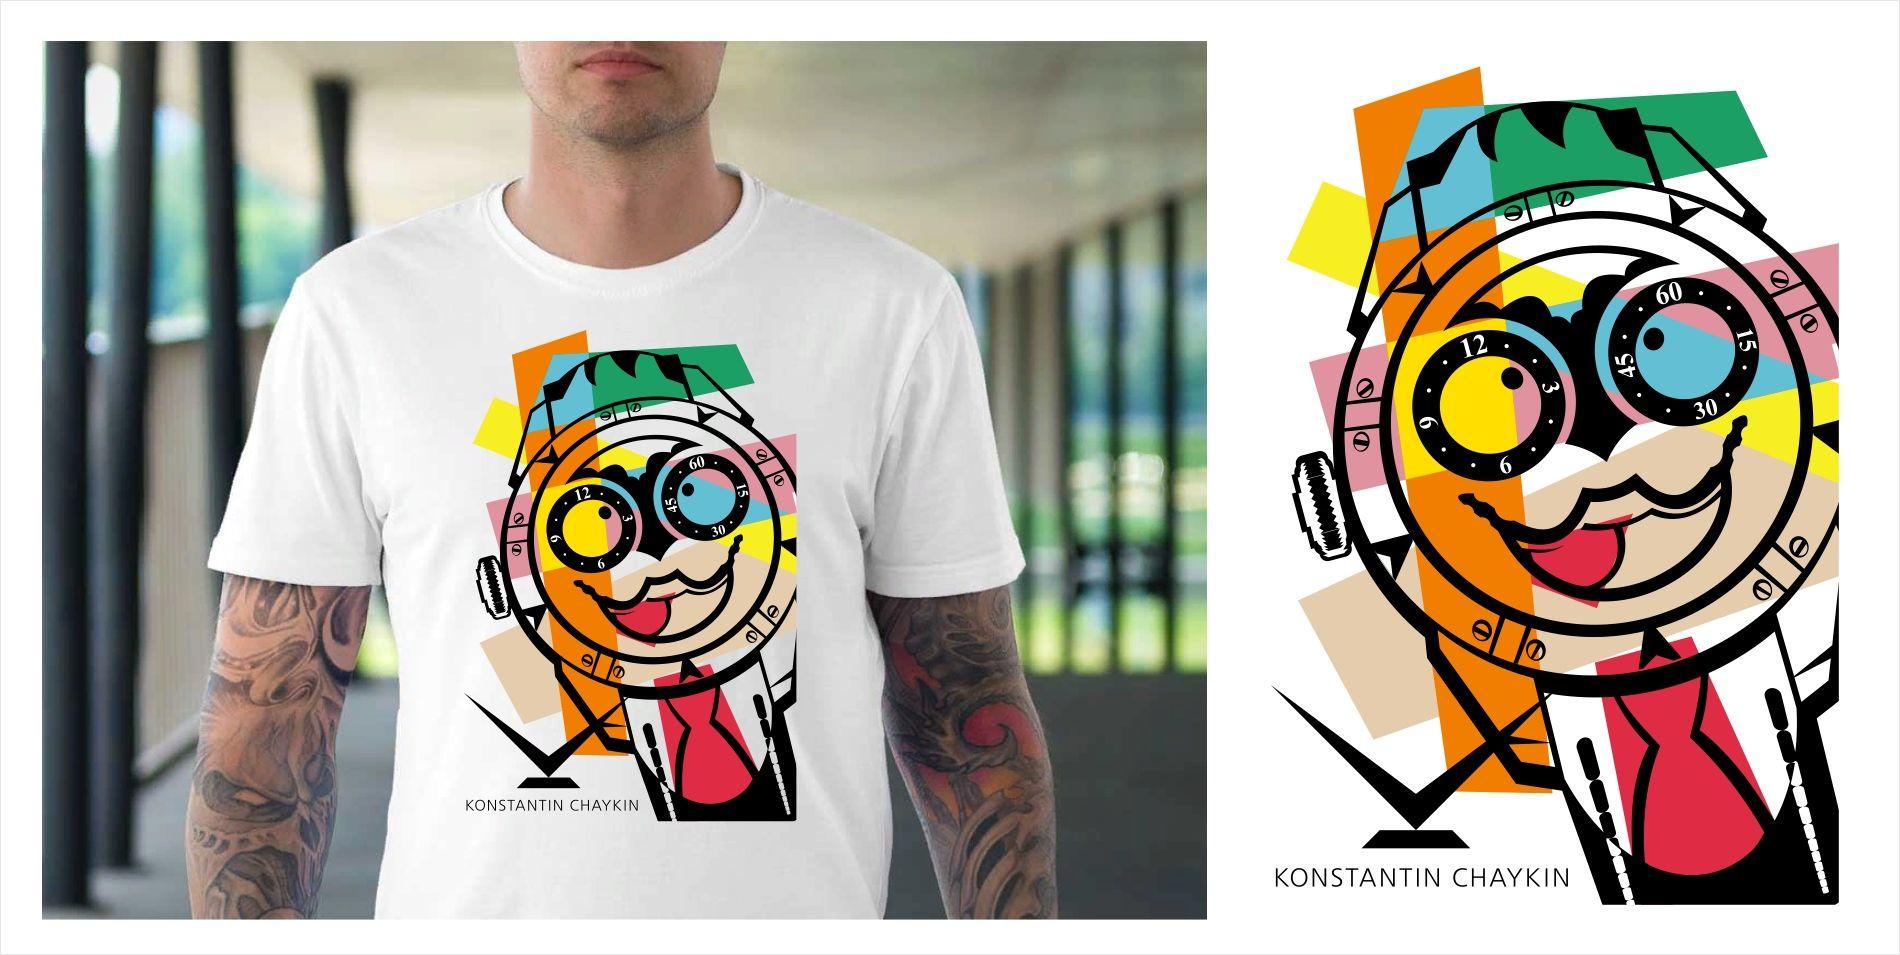 Футболка для Konstantin Chaykin - дизайнер kras-sky